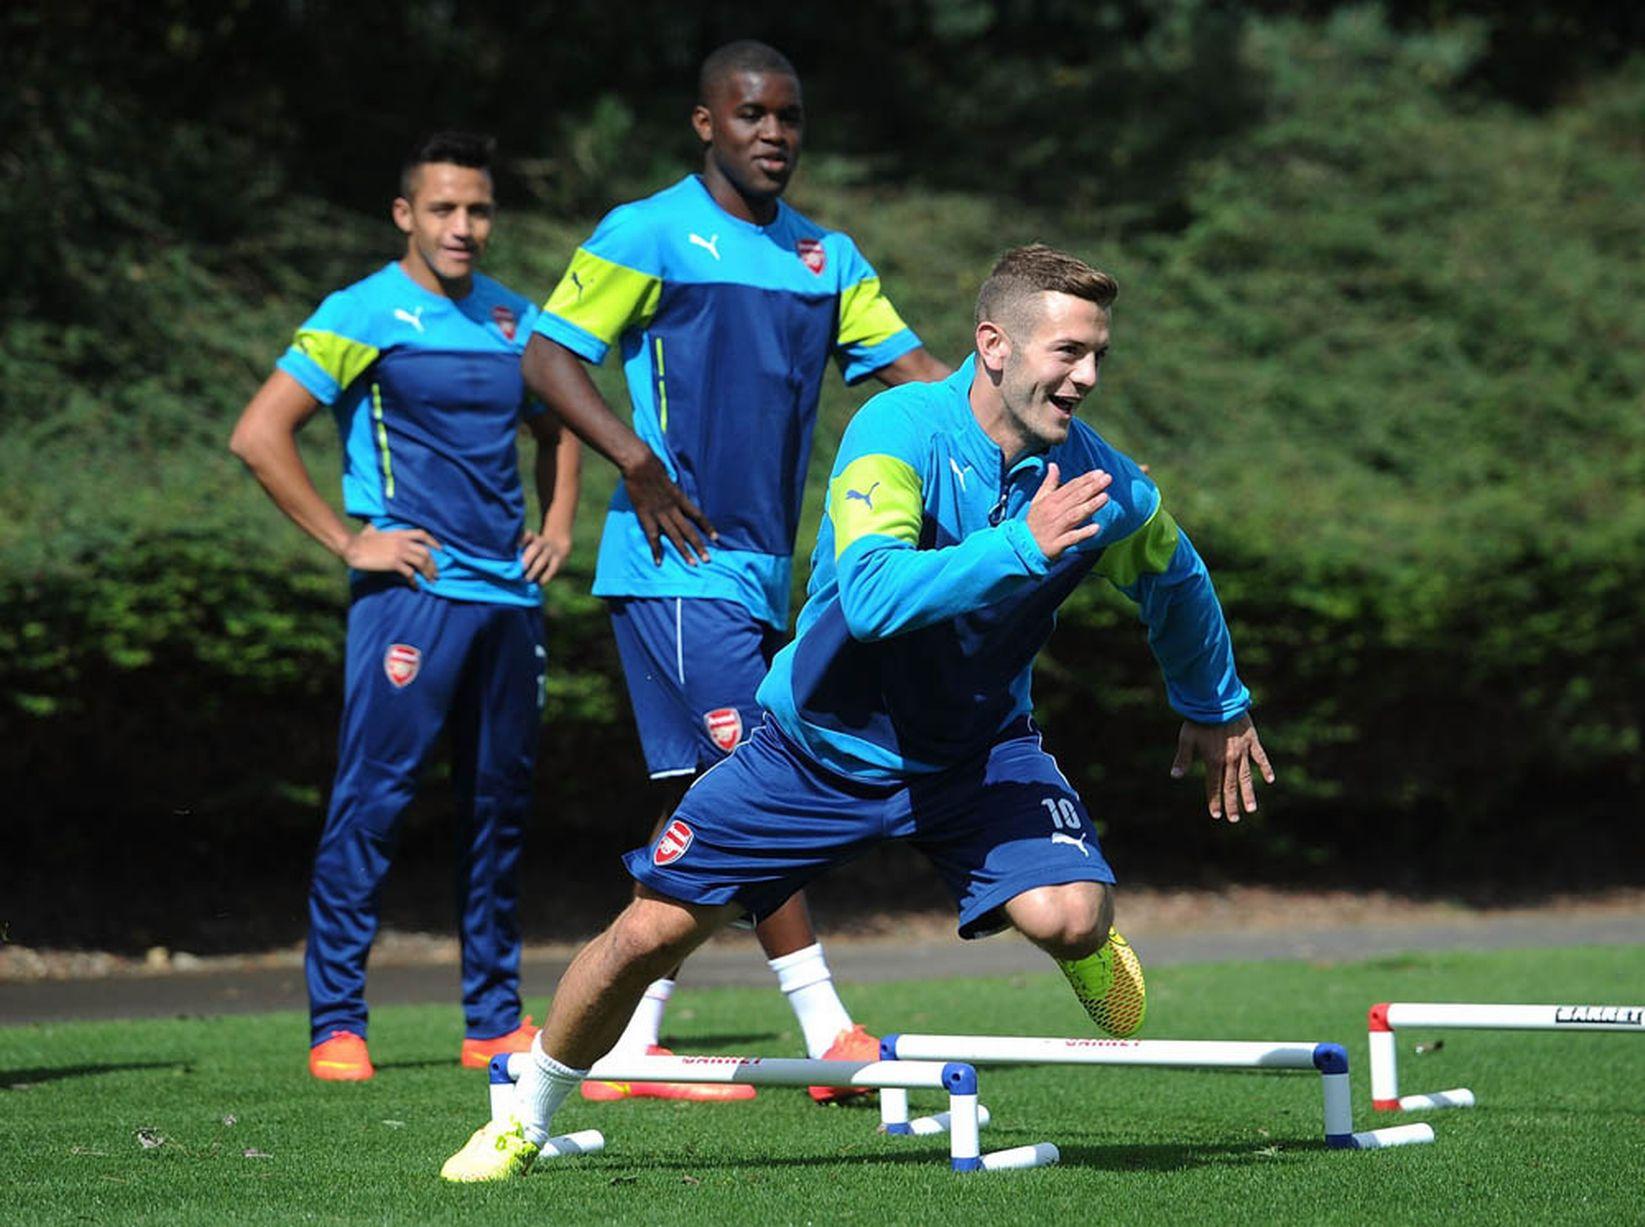 Arsenal-Training-Pics